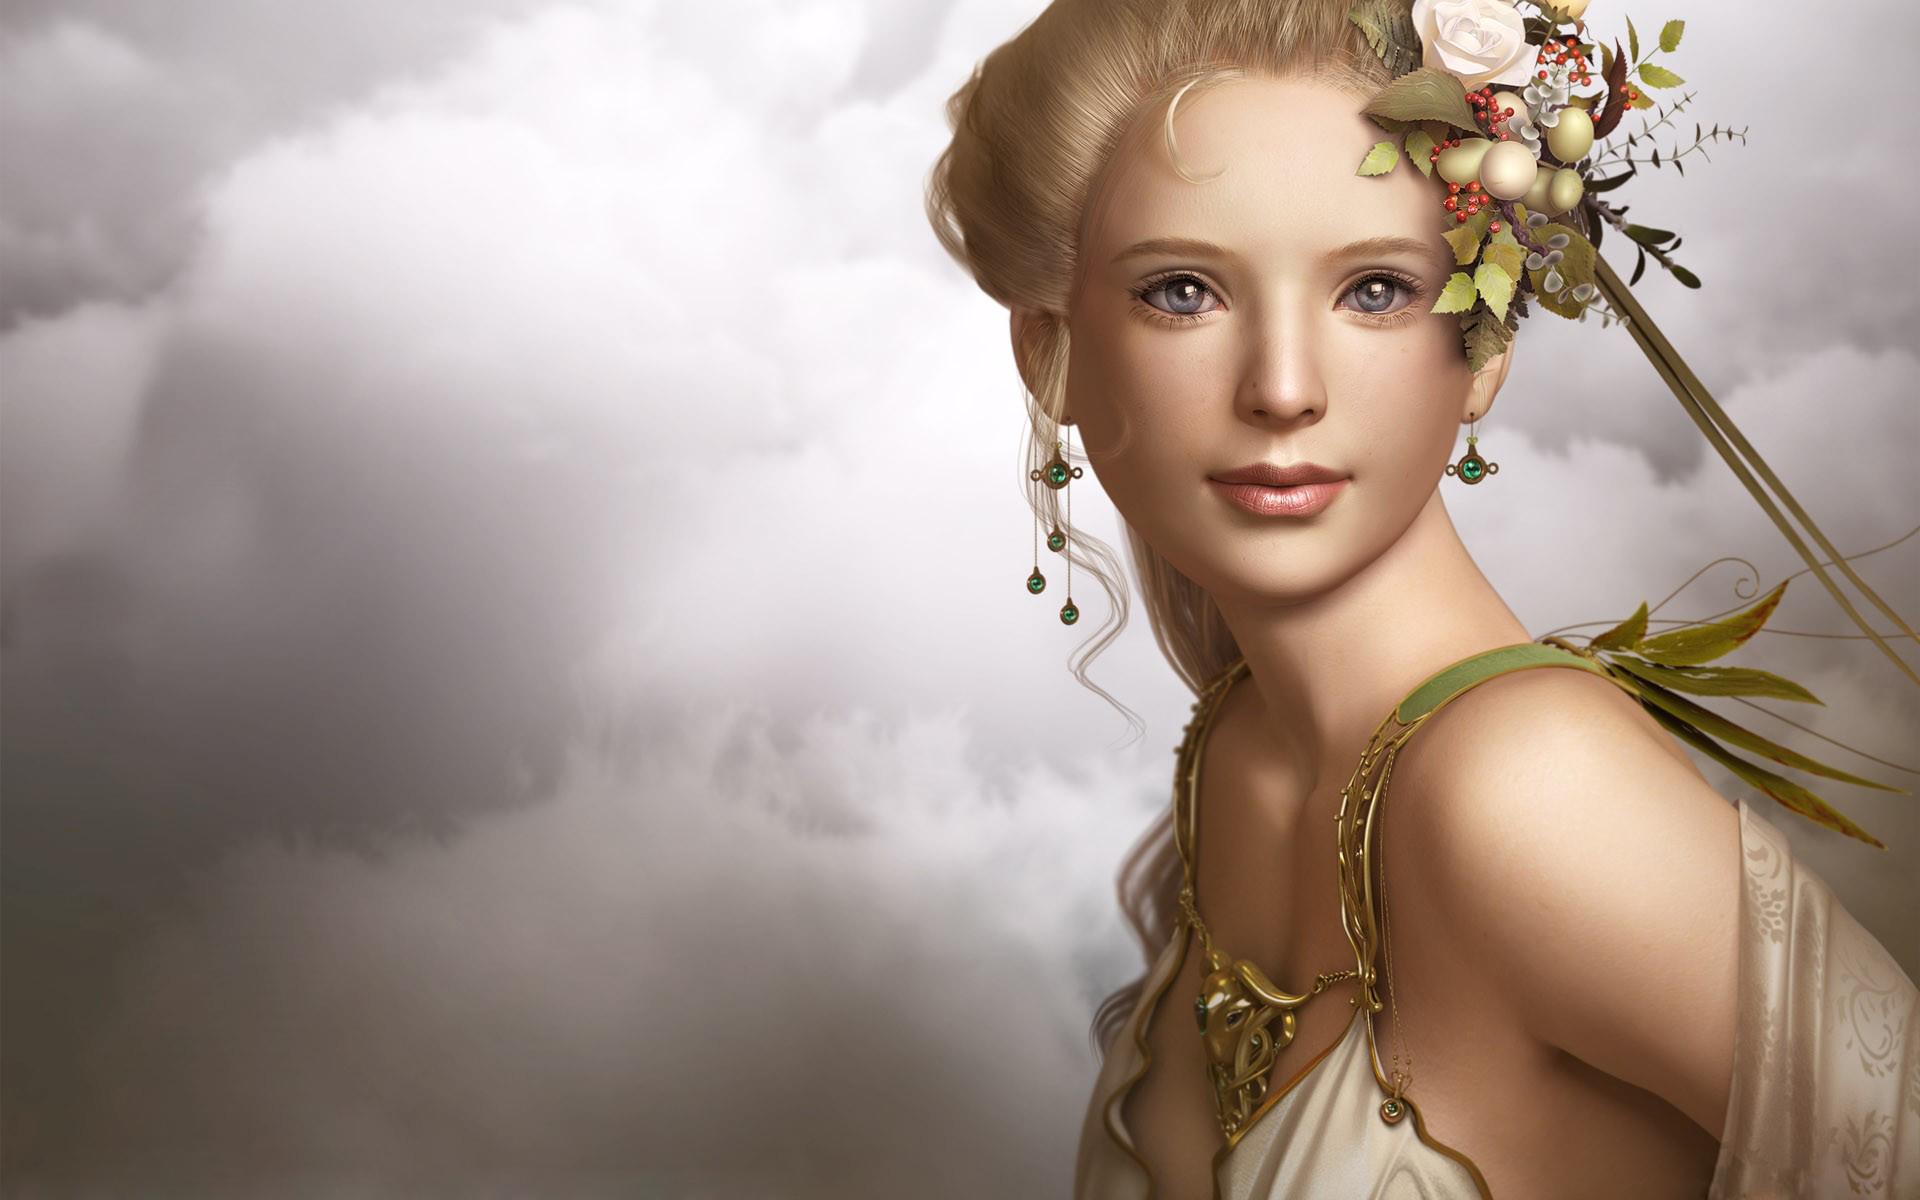 americas digital goddess - HD1920×1200